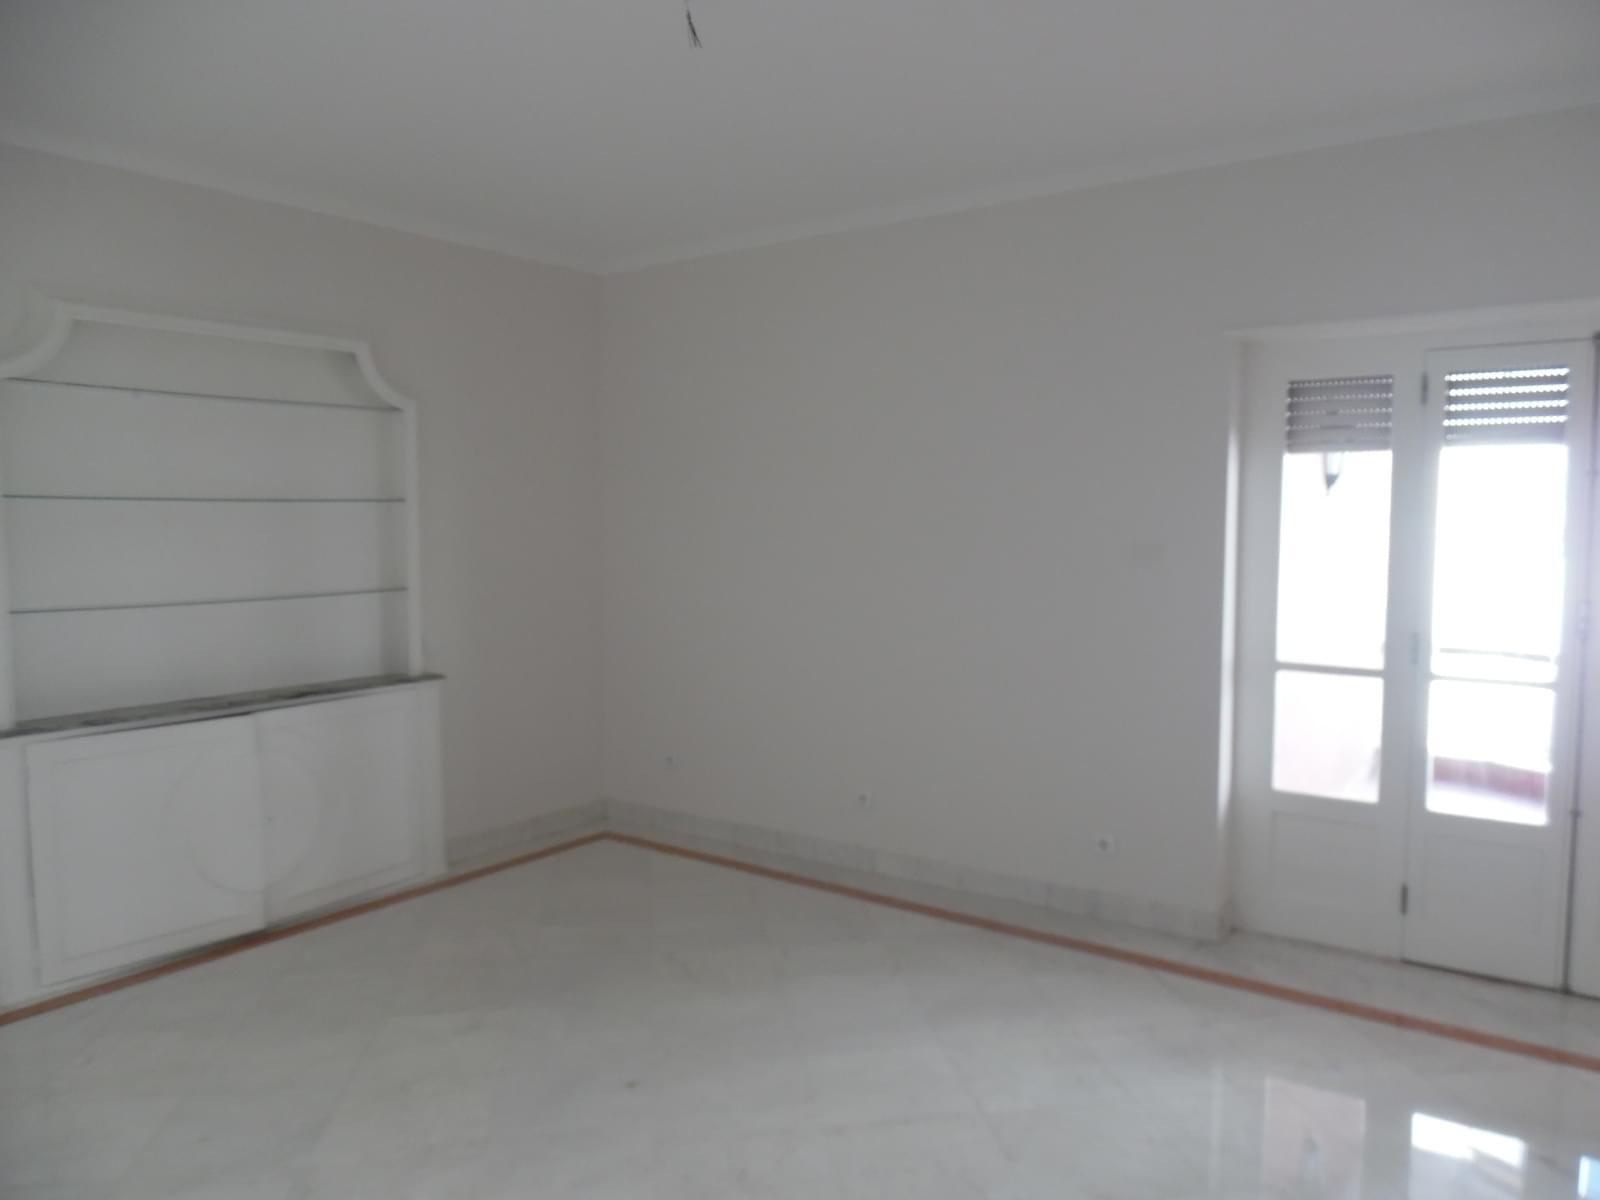 pf17621-apartamento-t4-lisboa-e0b0f5a6-d27e-4116-8e85-c5047a8dd5b1